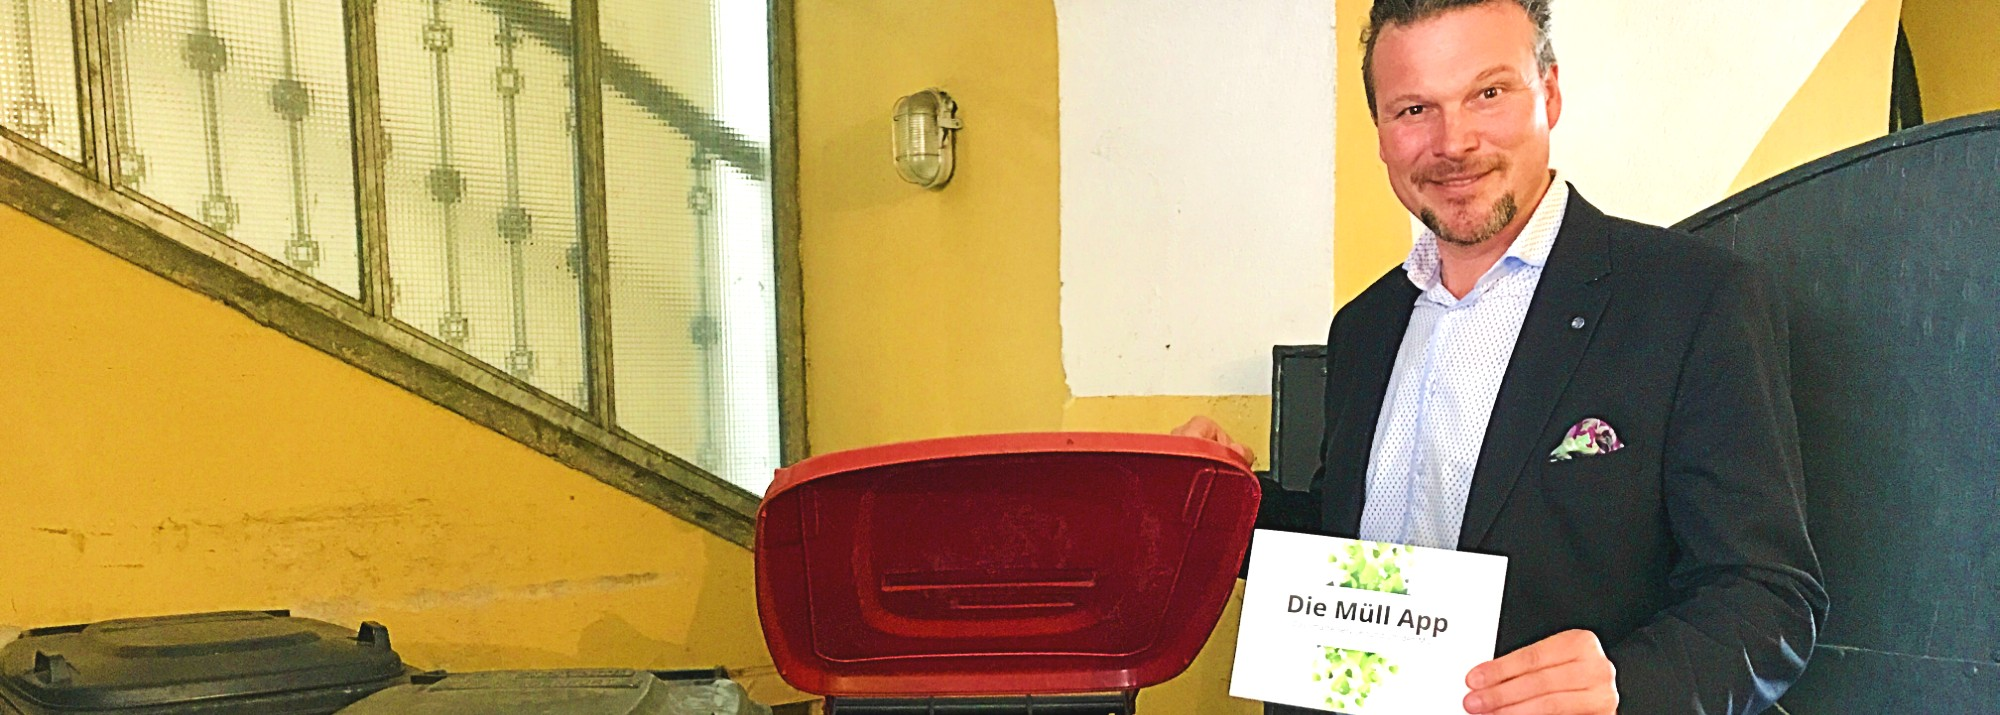 Interview mit Vizebürgermeister Wolfgang Germ zur Müll App